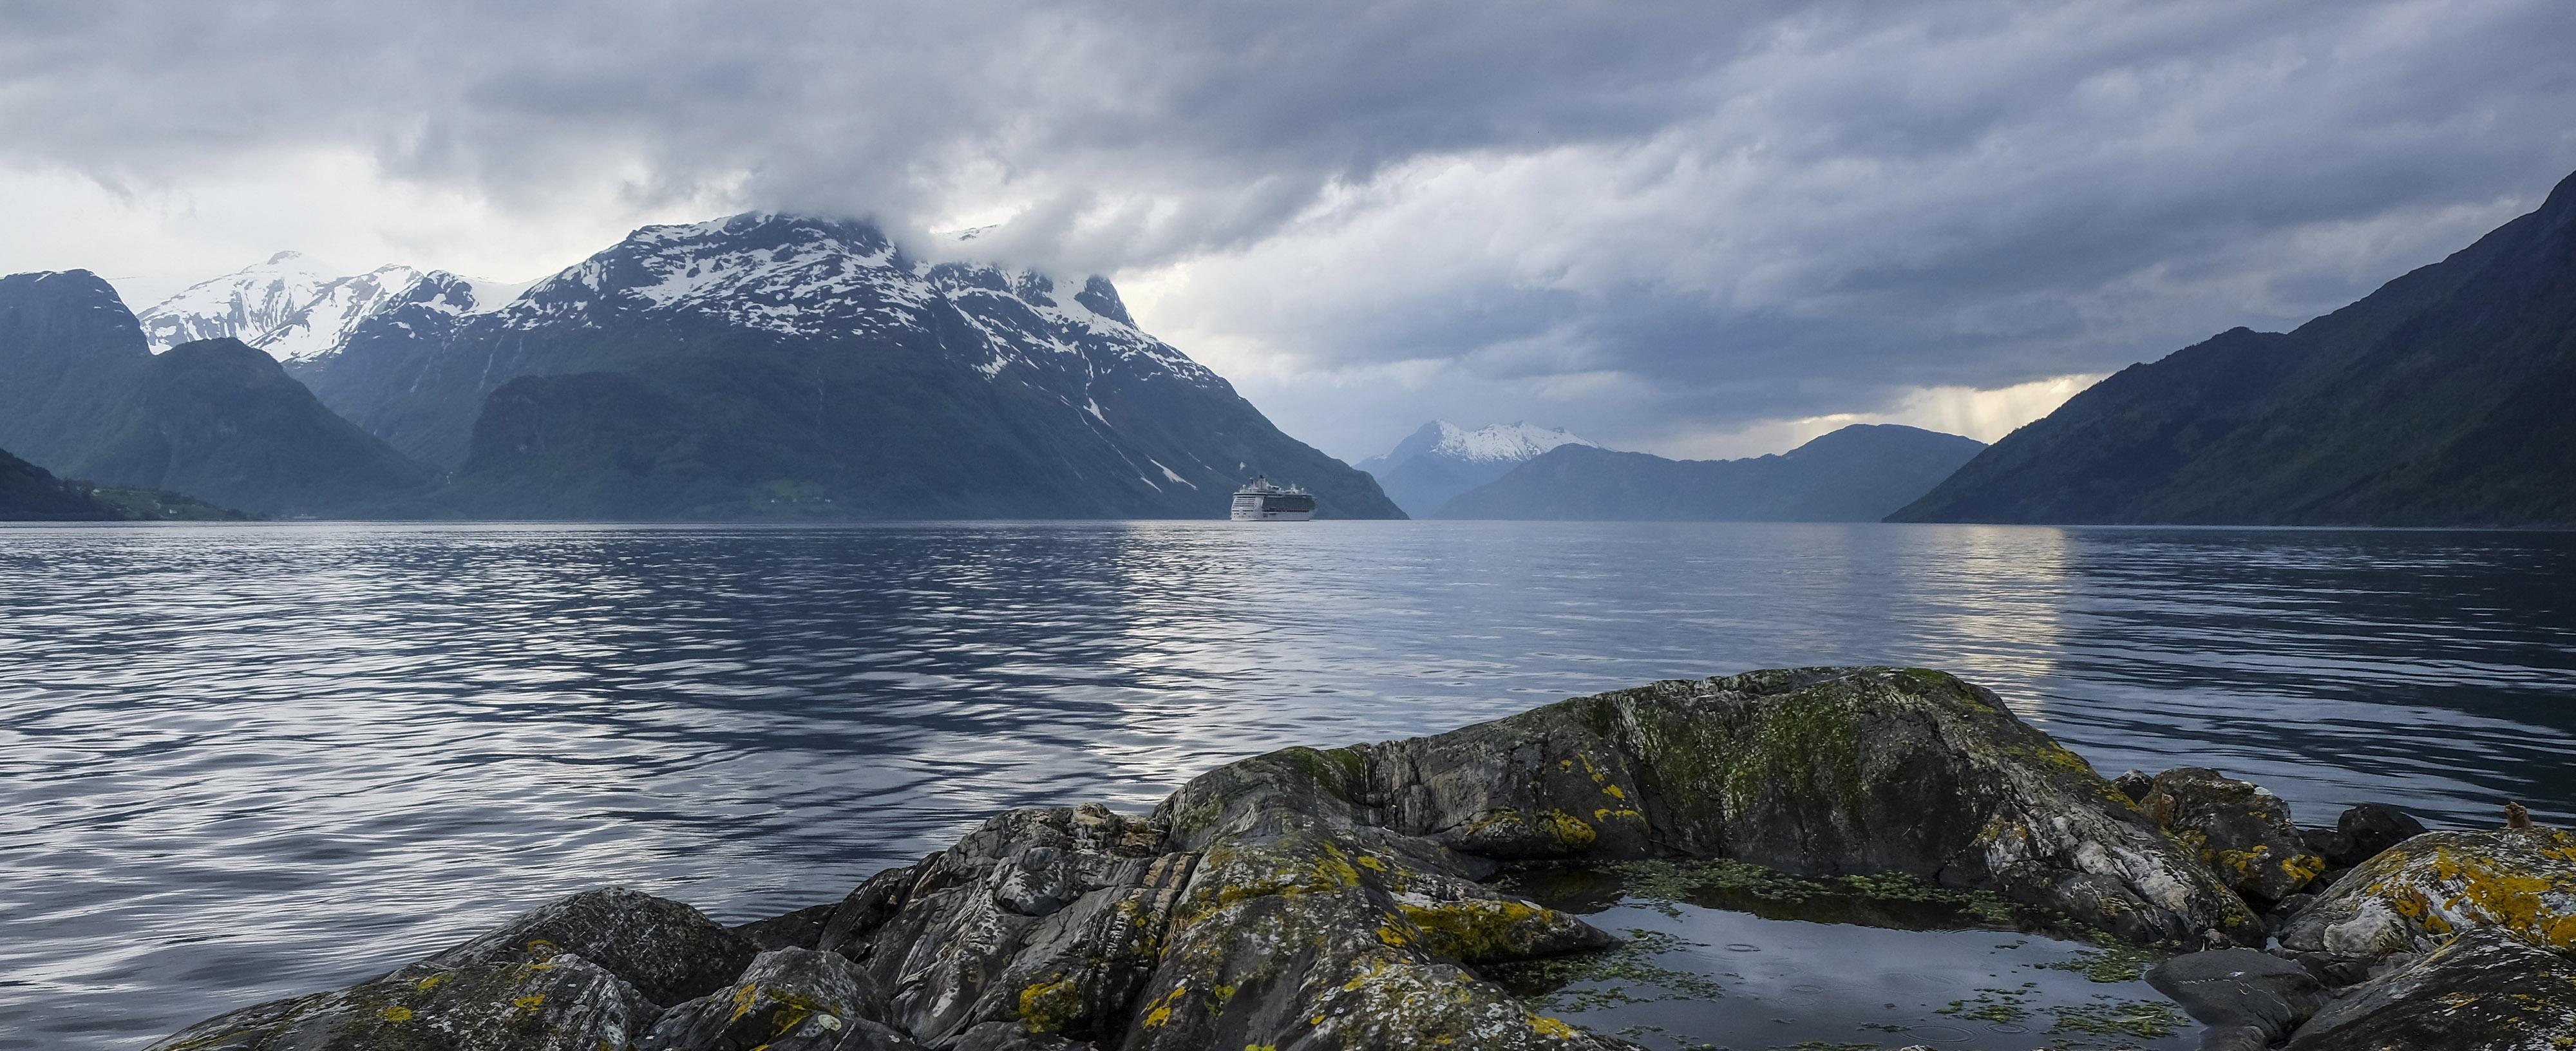 Lote, Norway - Steinar La Engeland